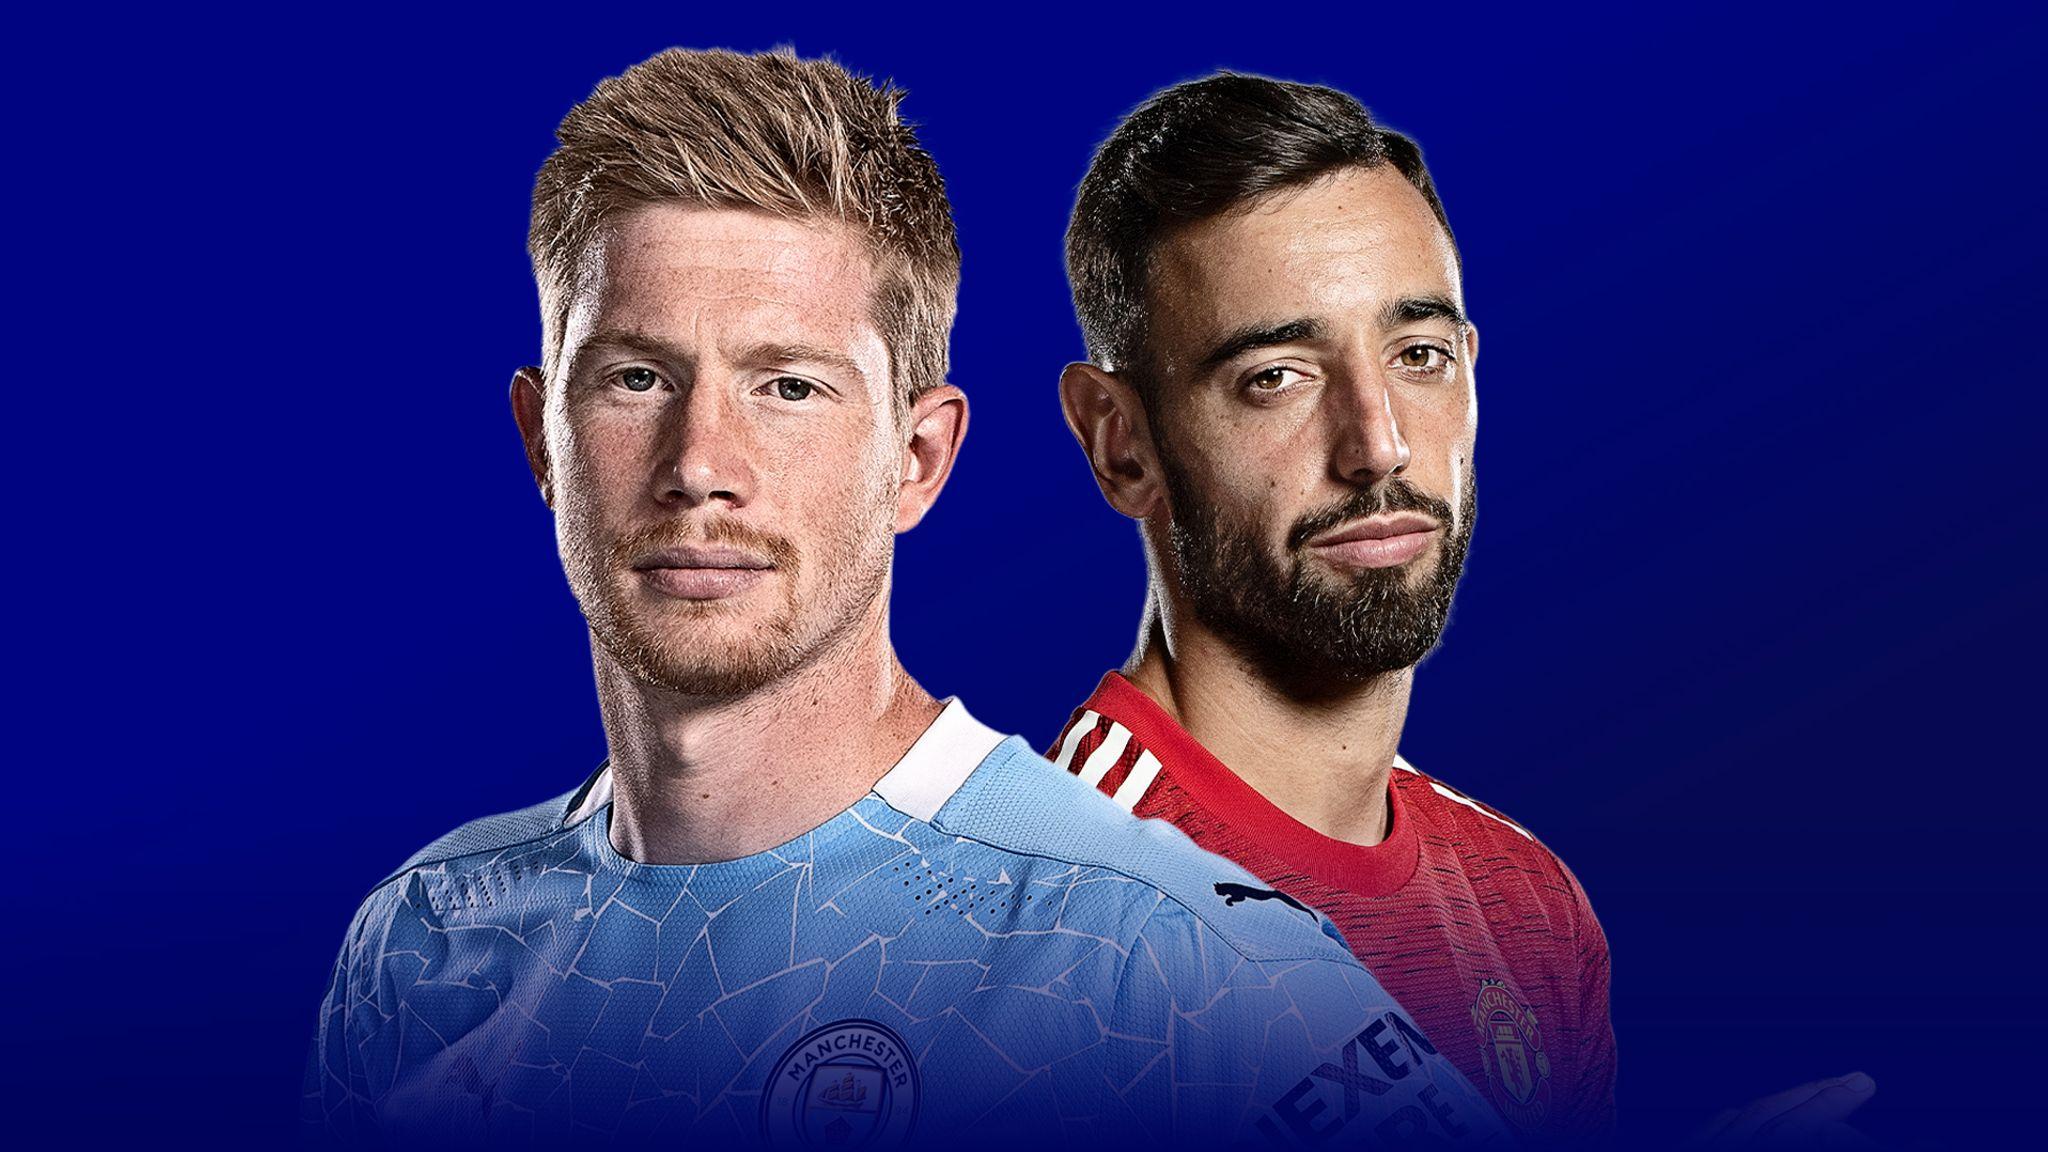 Live match preview - Man City vs Man Utd 07.03.2021